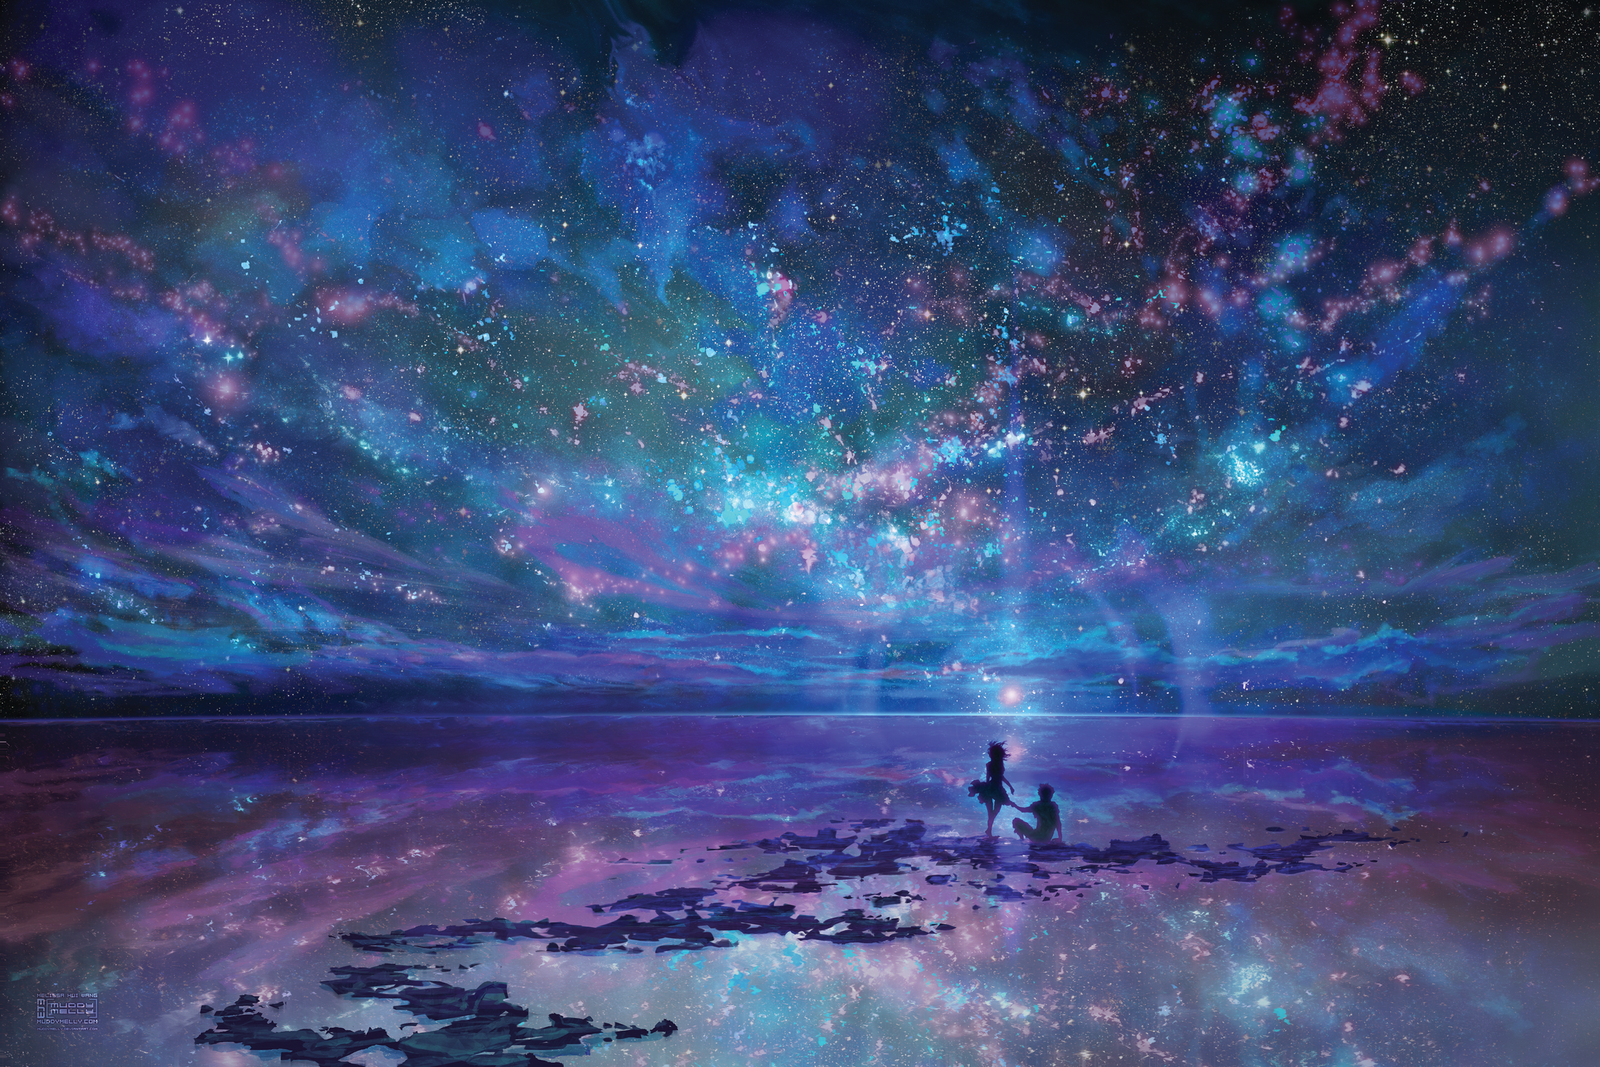 Звёздное небо и космос в картинках - Страница 39 B8ce4fa07447c6efd9eb44a1b7b54634